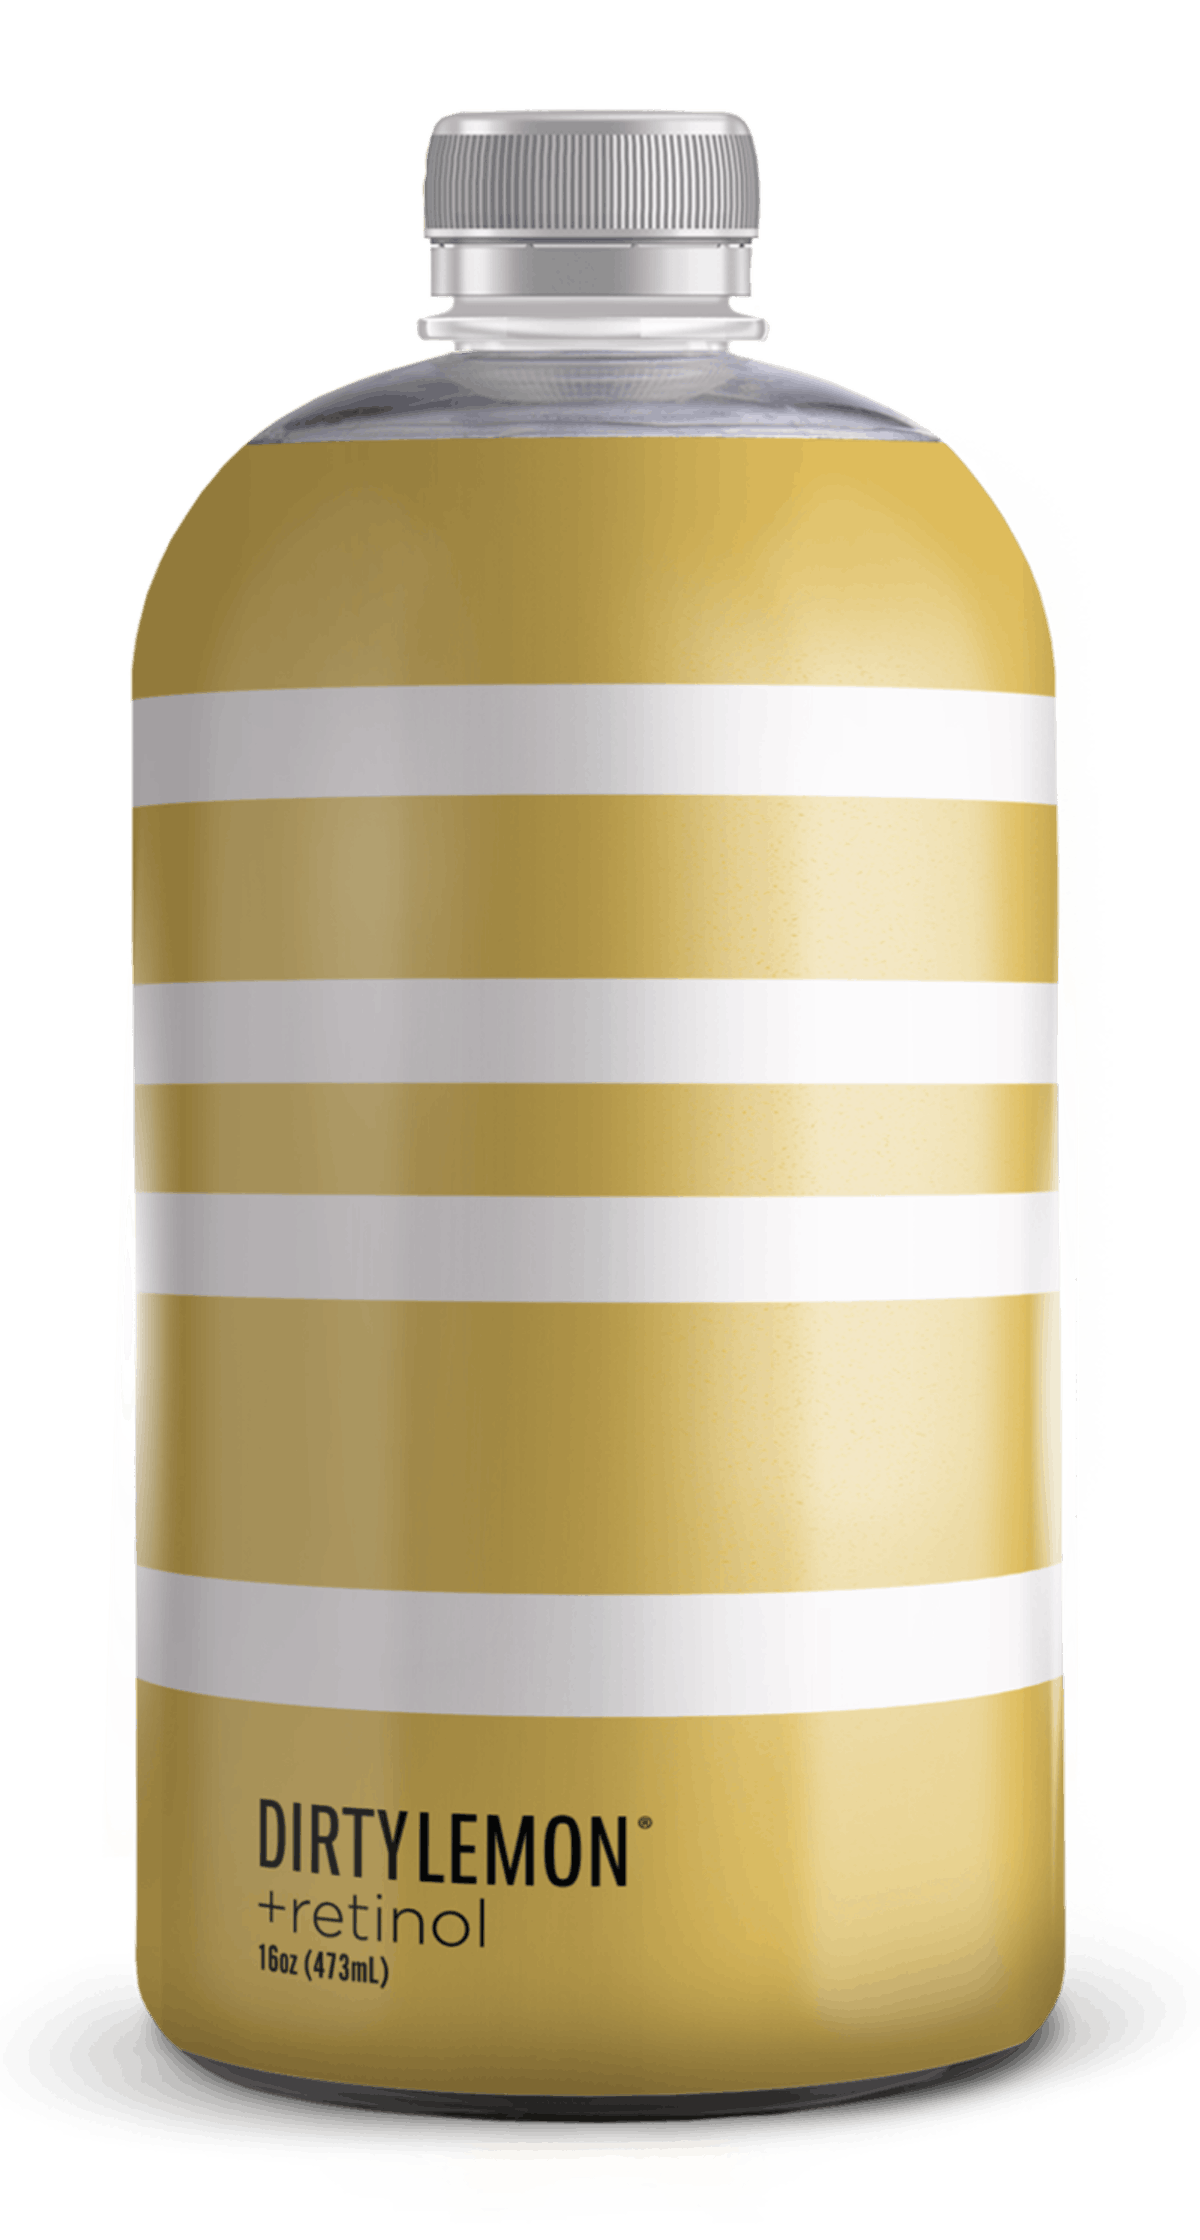 Dirty Lemon +Retinol